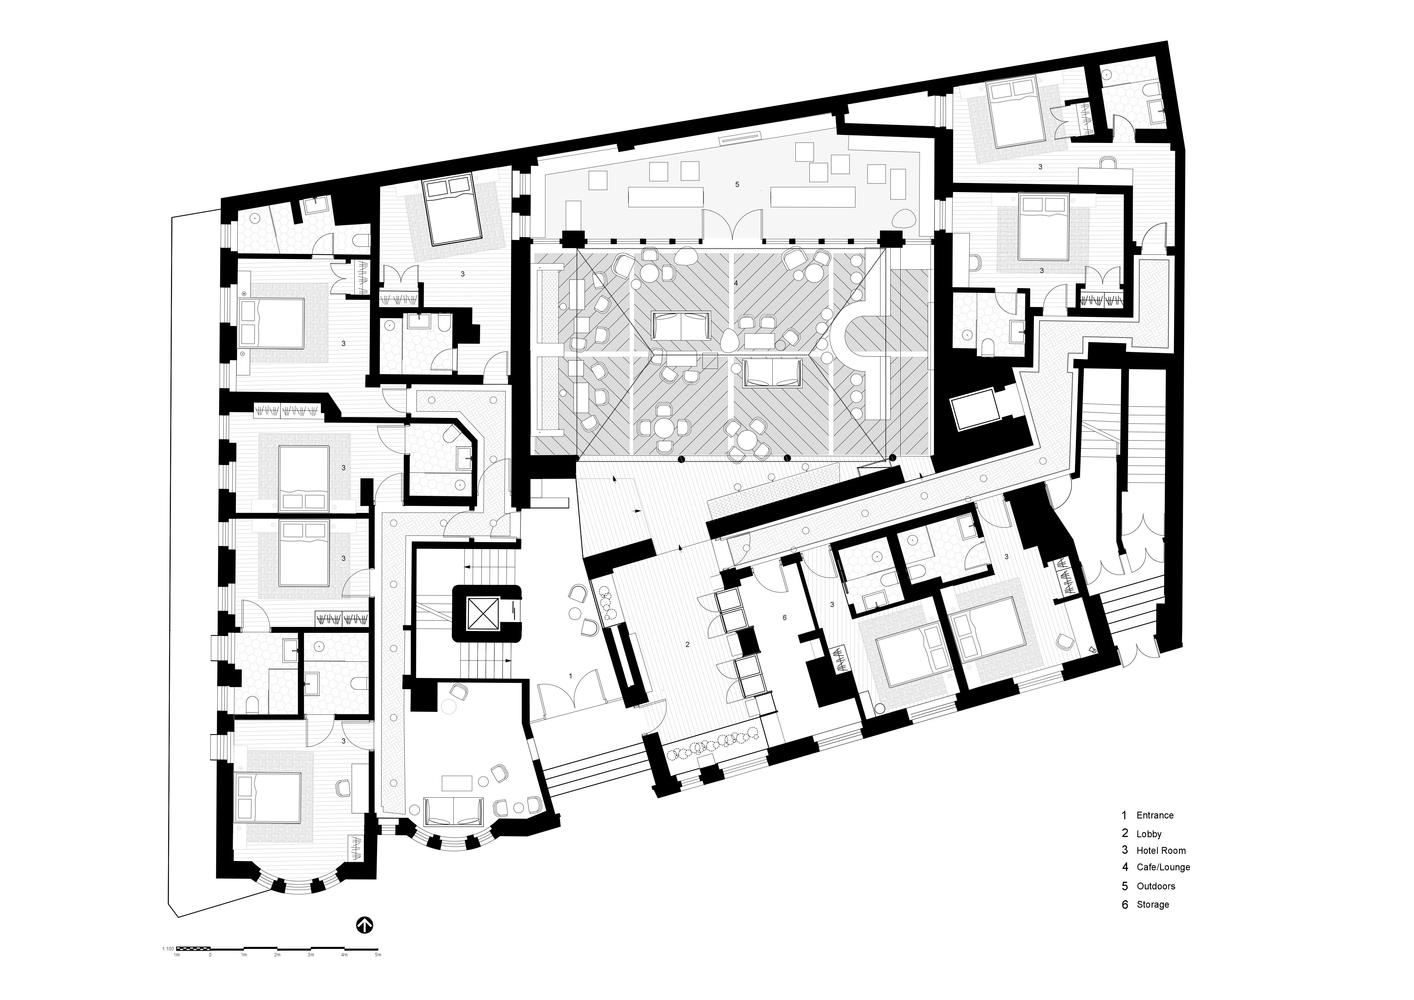 Gallery Of Mychelsea Boutique Hotel Design Haus Liberty 20